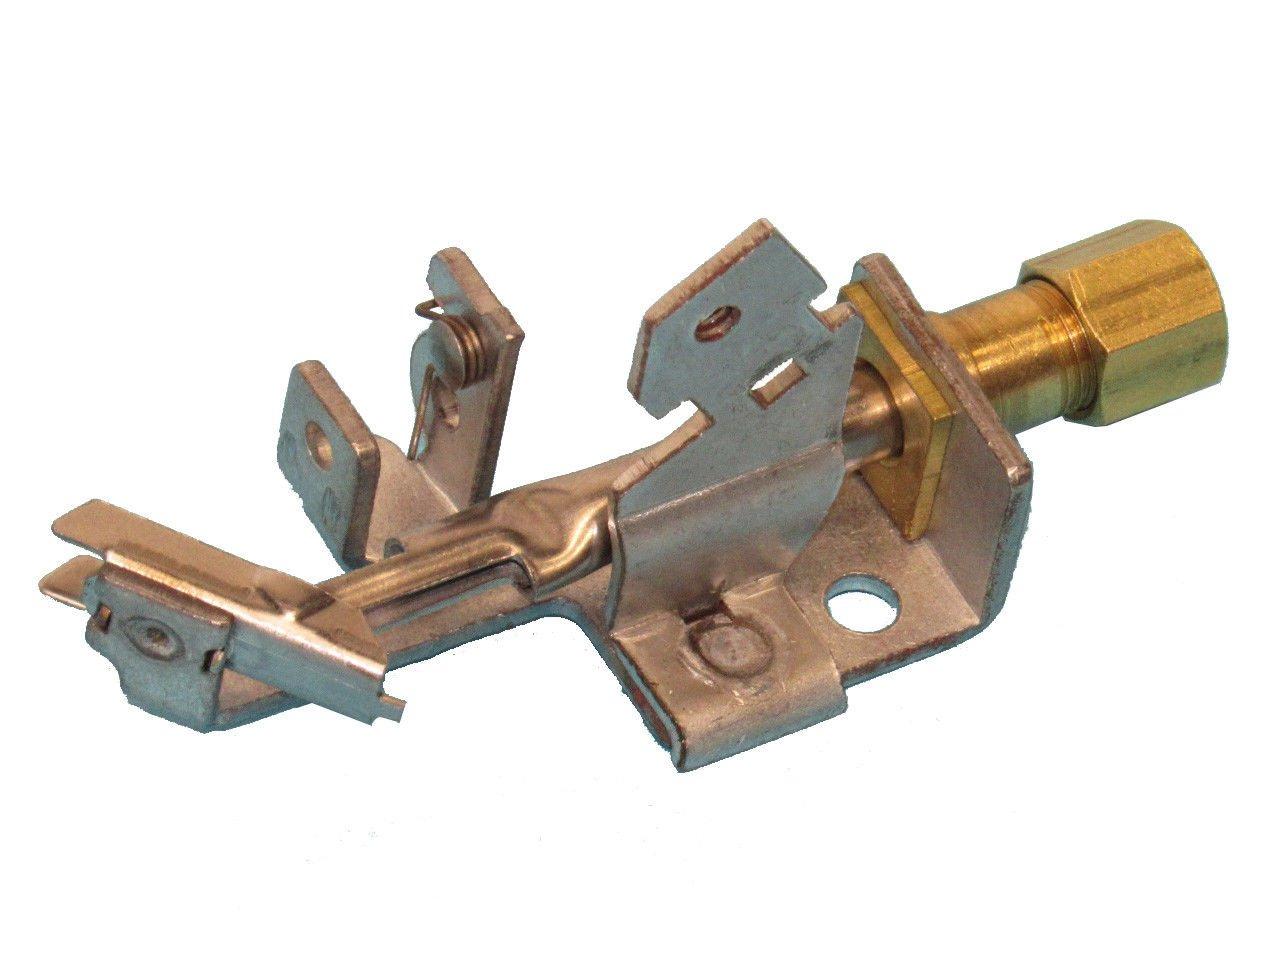 Whirlpool 4364169 Pilot Burner Genuine Original Equipment Manufacturer (OEM) Part for Roper & Whirlpool